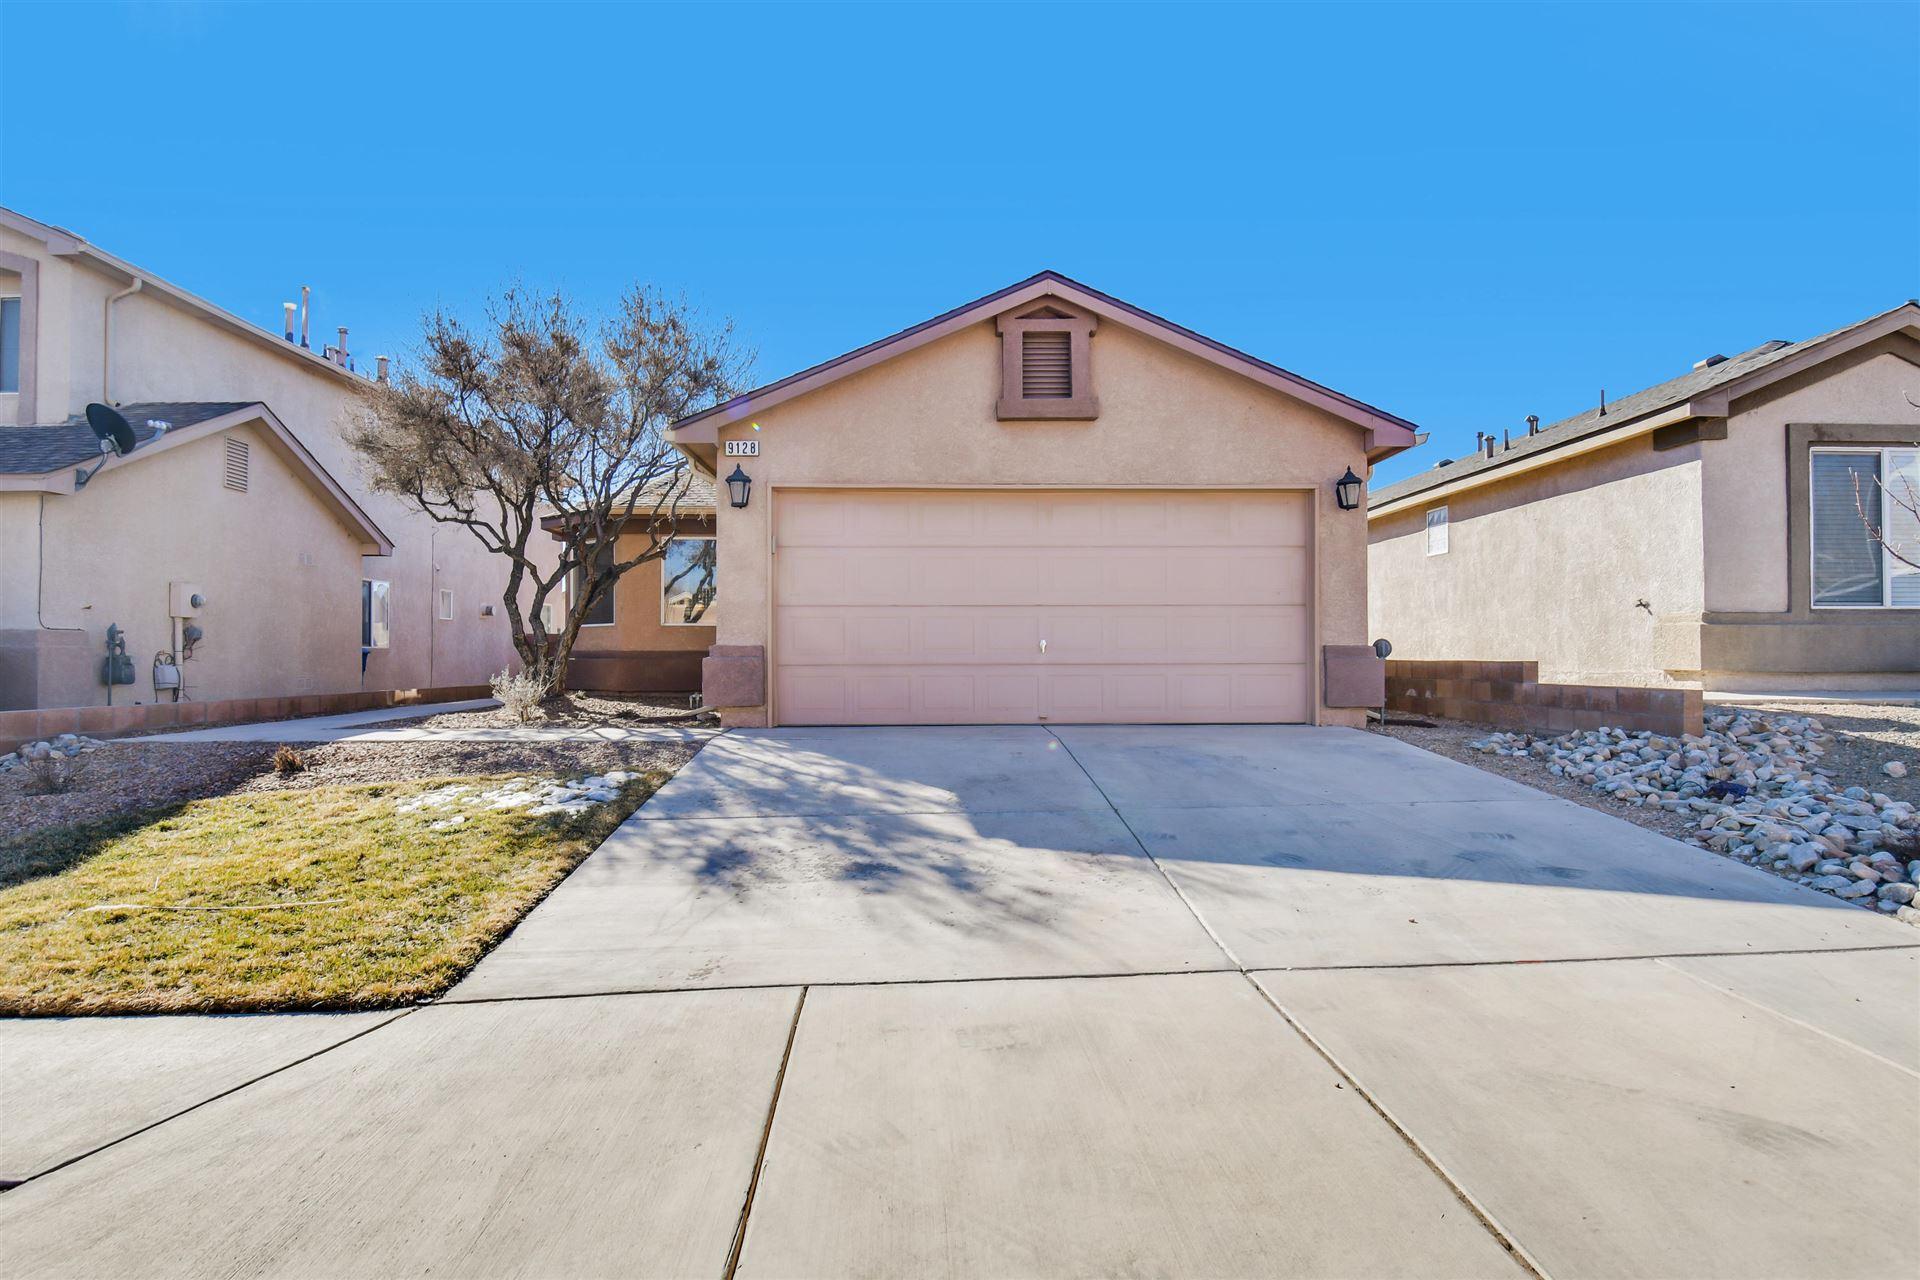 9128 VIOLET ORCHID Trail SW, Albuquerque, NM 87121 - MLS#: 986502